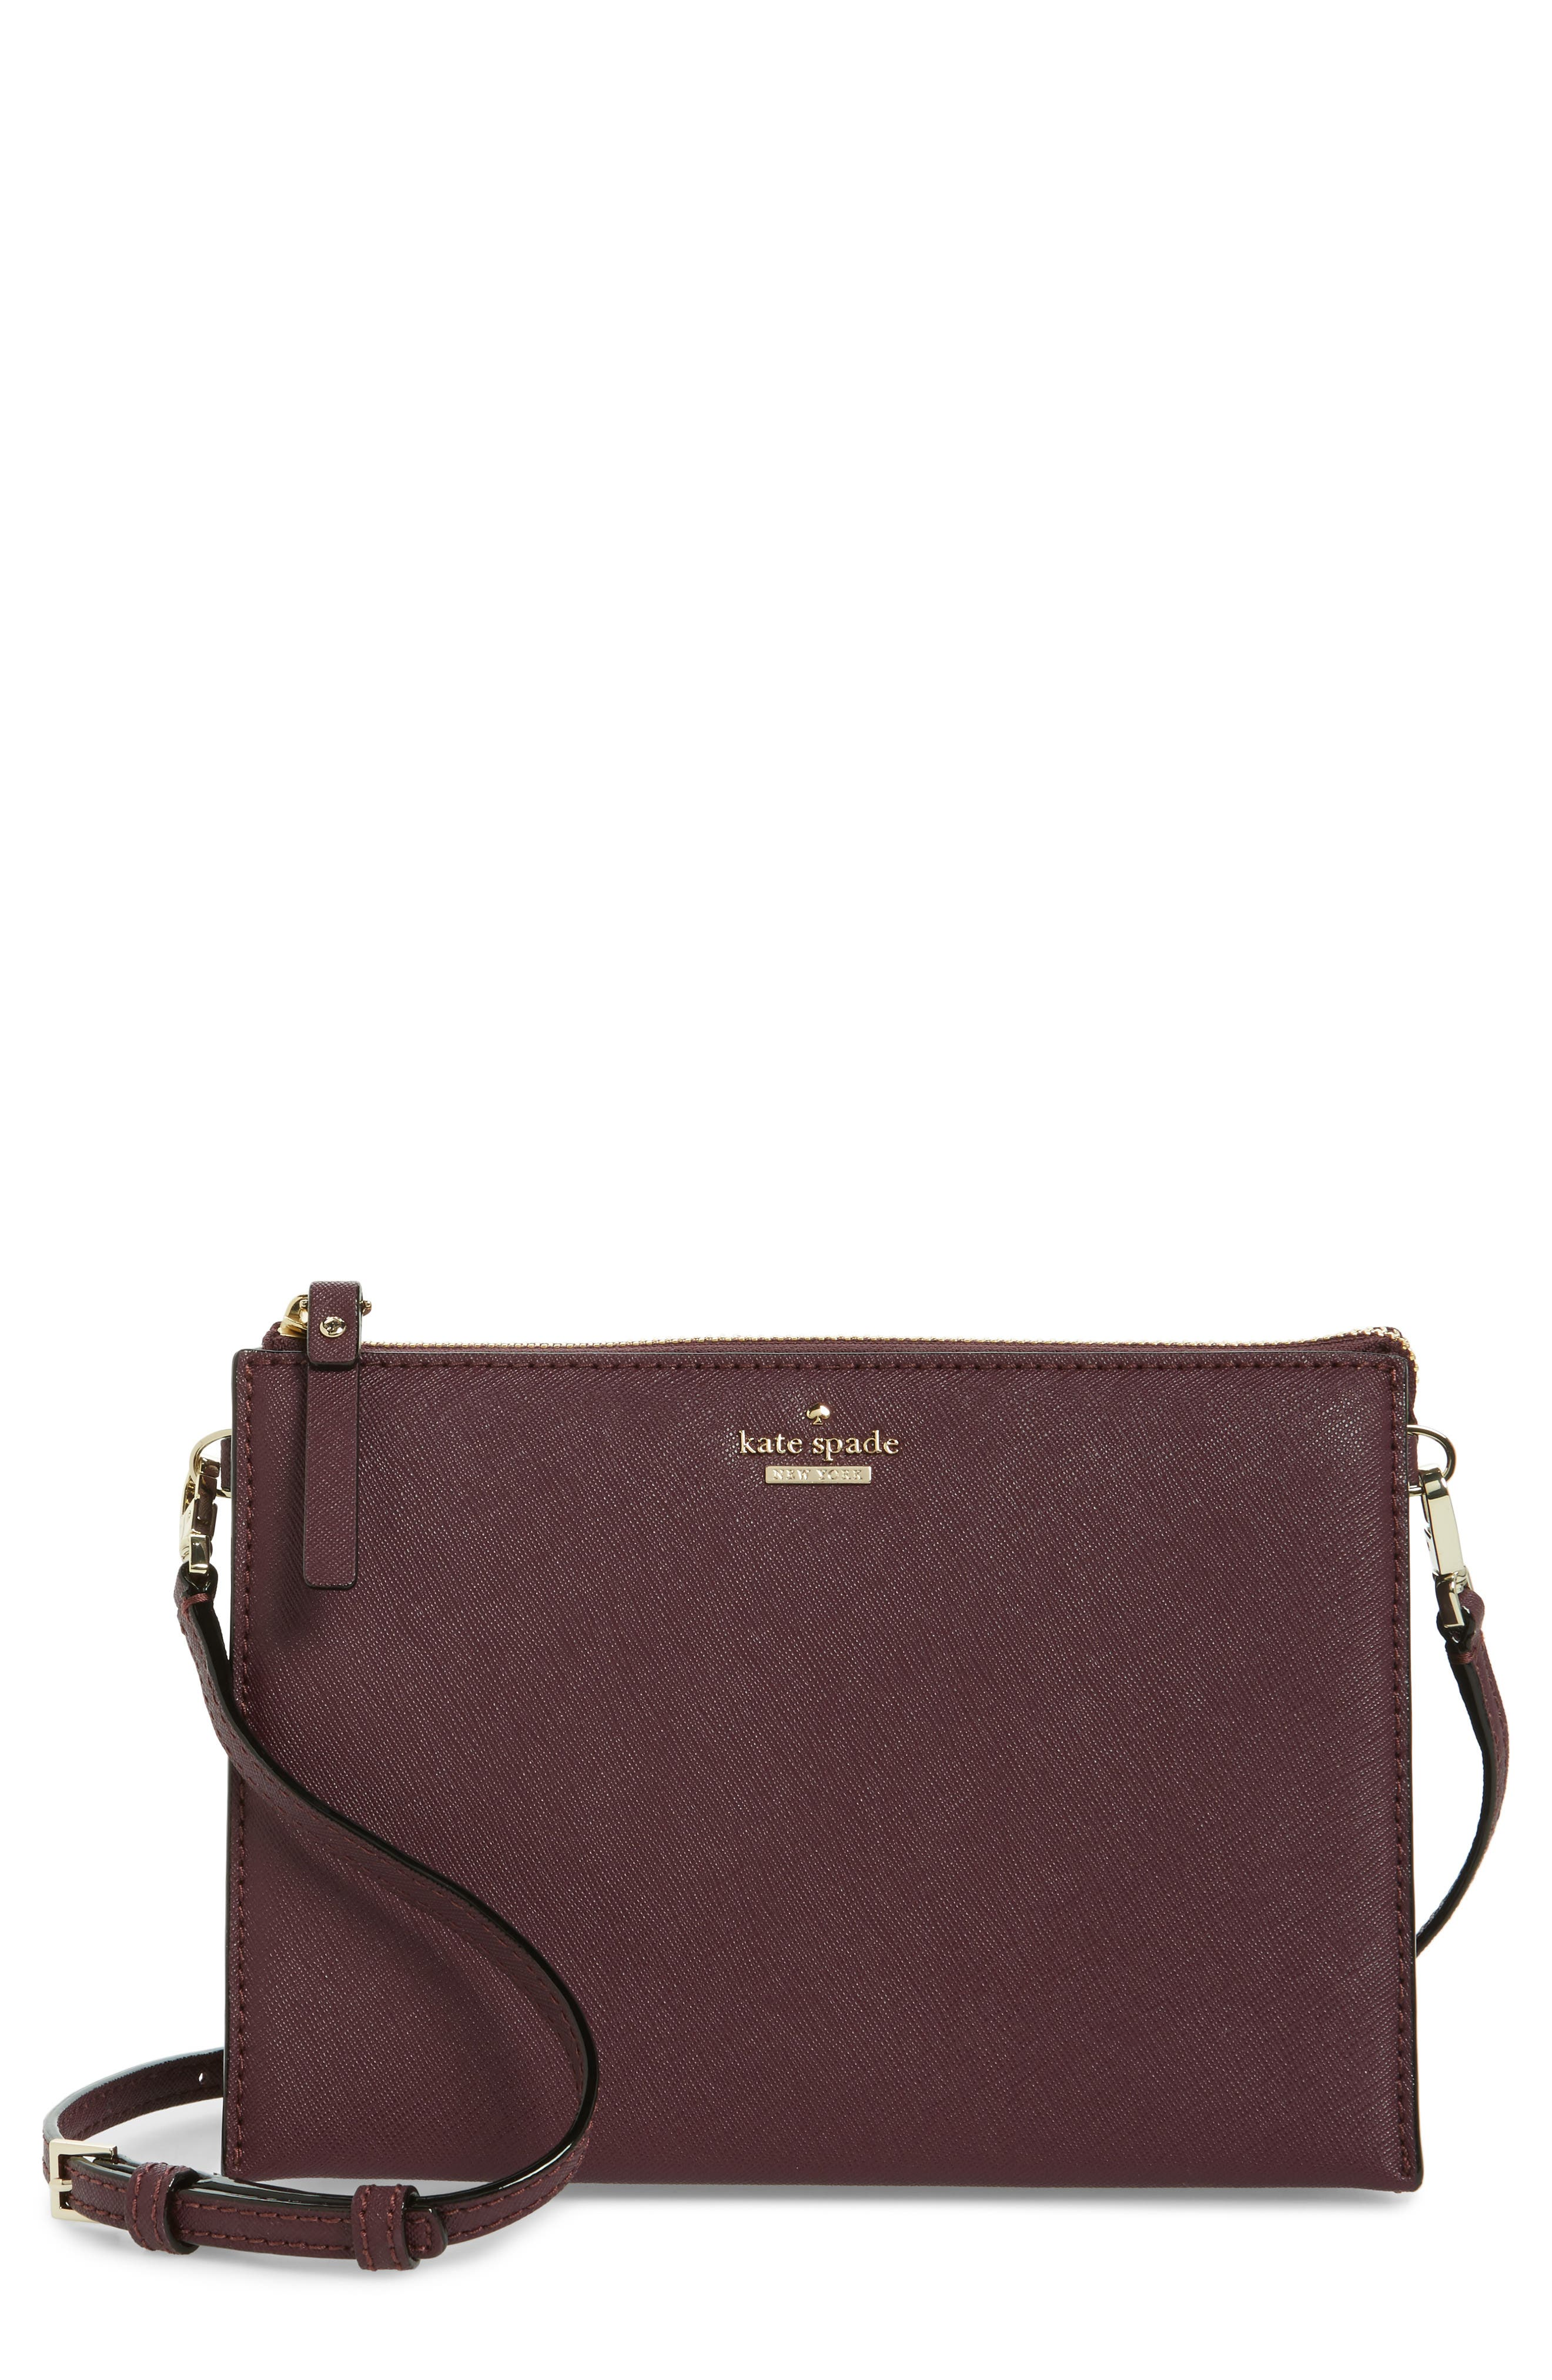 kate spade new york cameron street - dilon leather crossbody bag